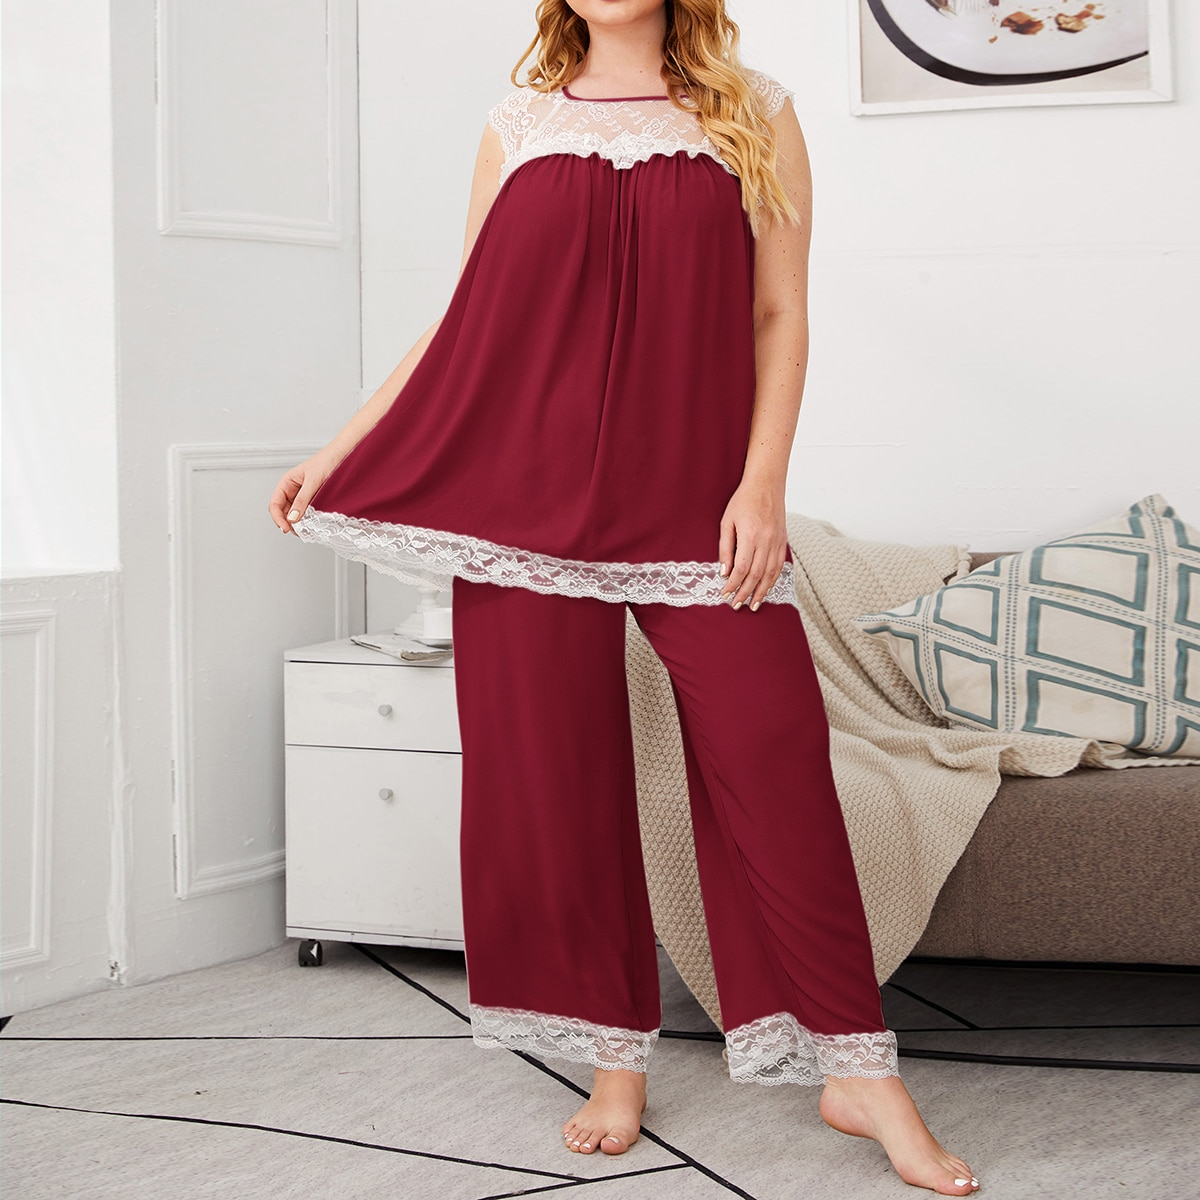 shein Bordeaux Elegant Kleurblok Grote maten pyjama sets Contract kant